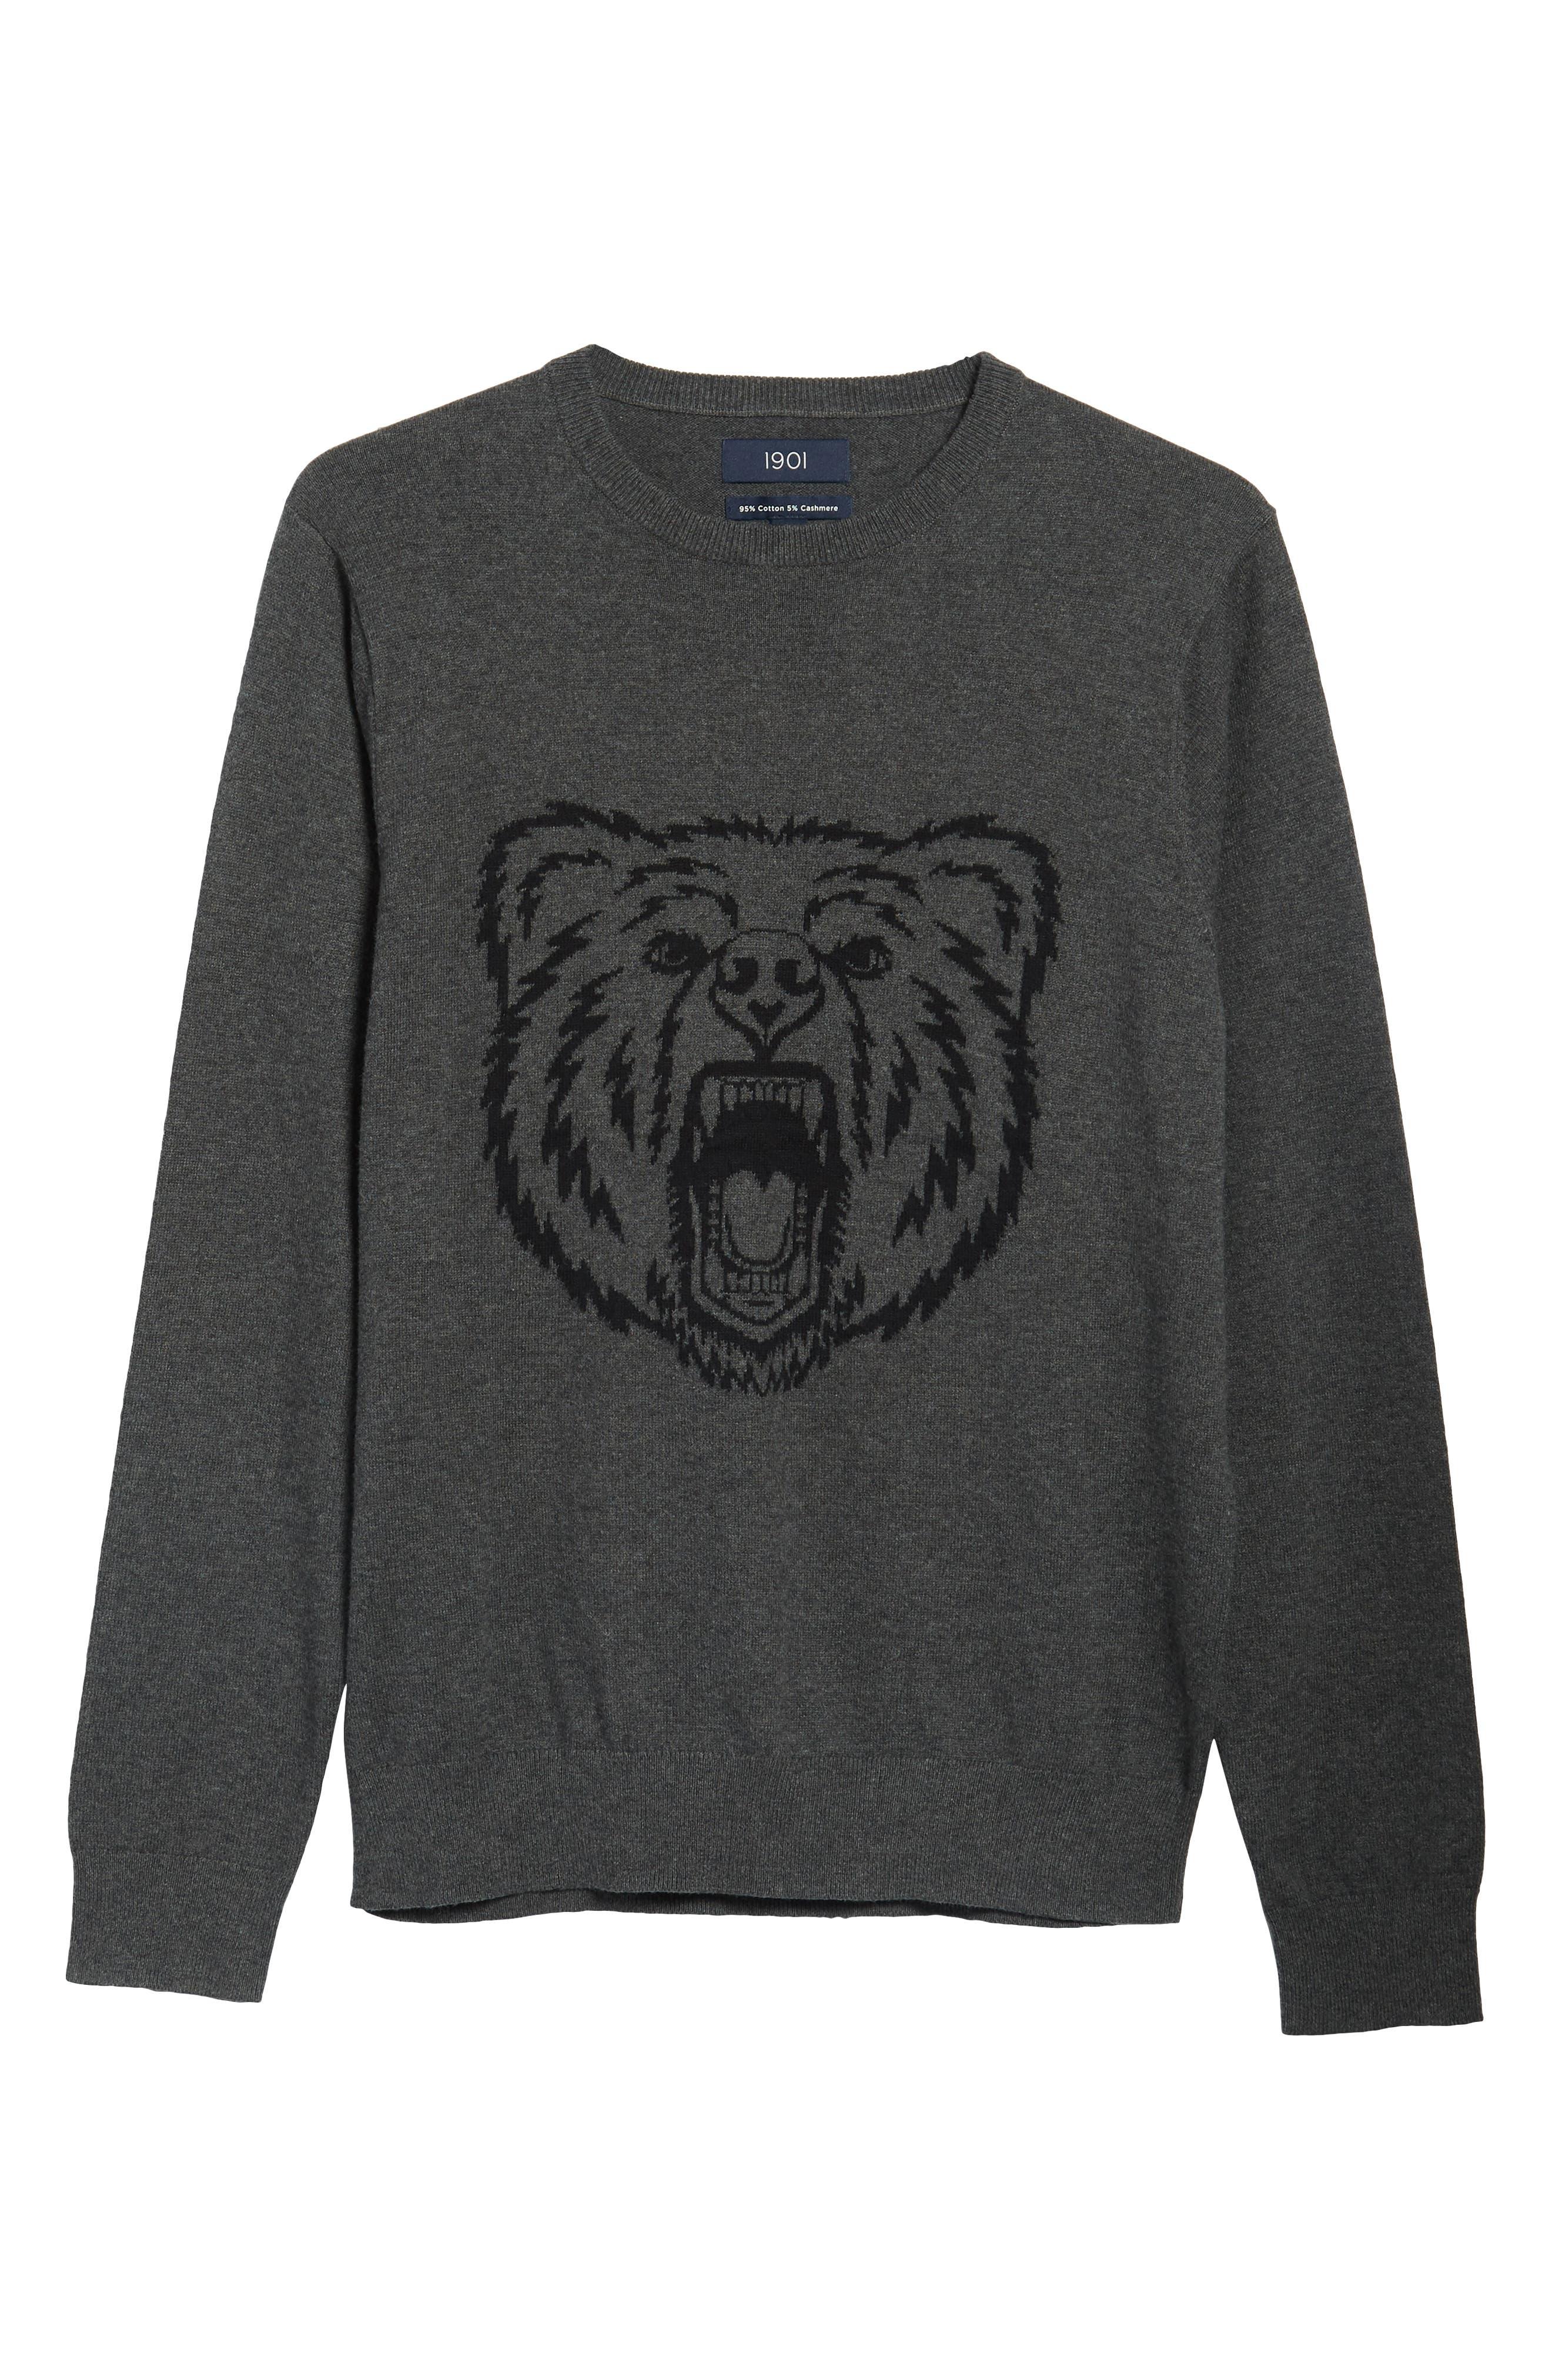 Bear Crewneck Sweater,                             Alternate thumbnail 6, color,                             GREY CASTLEROCK MARL BEAR